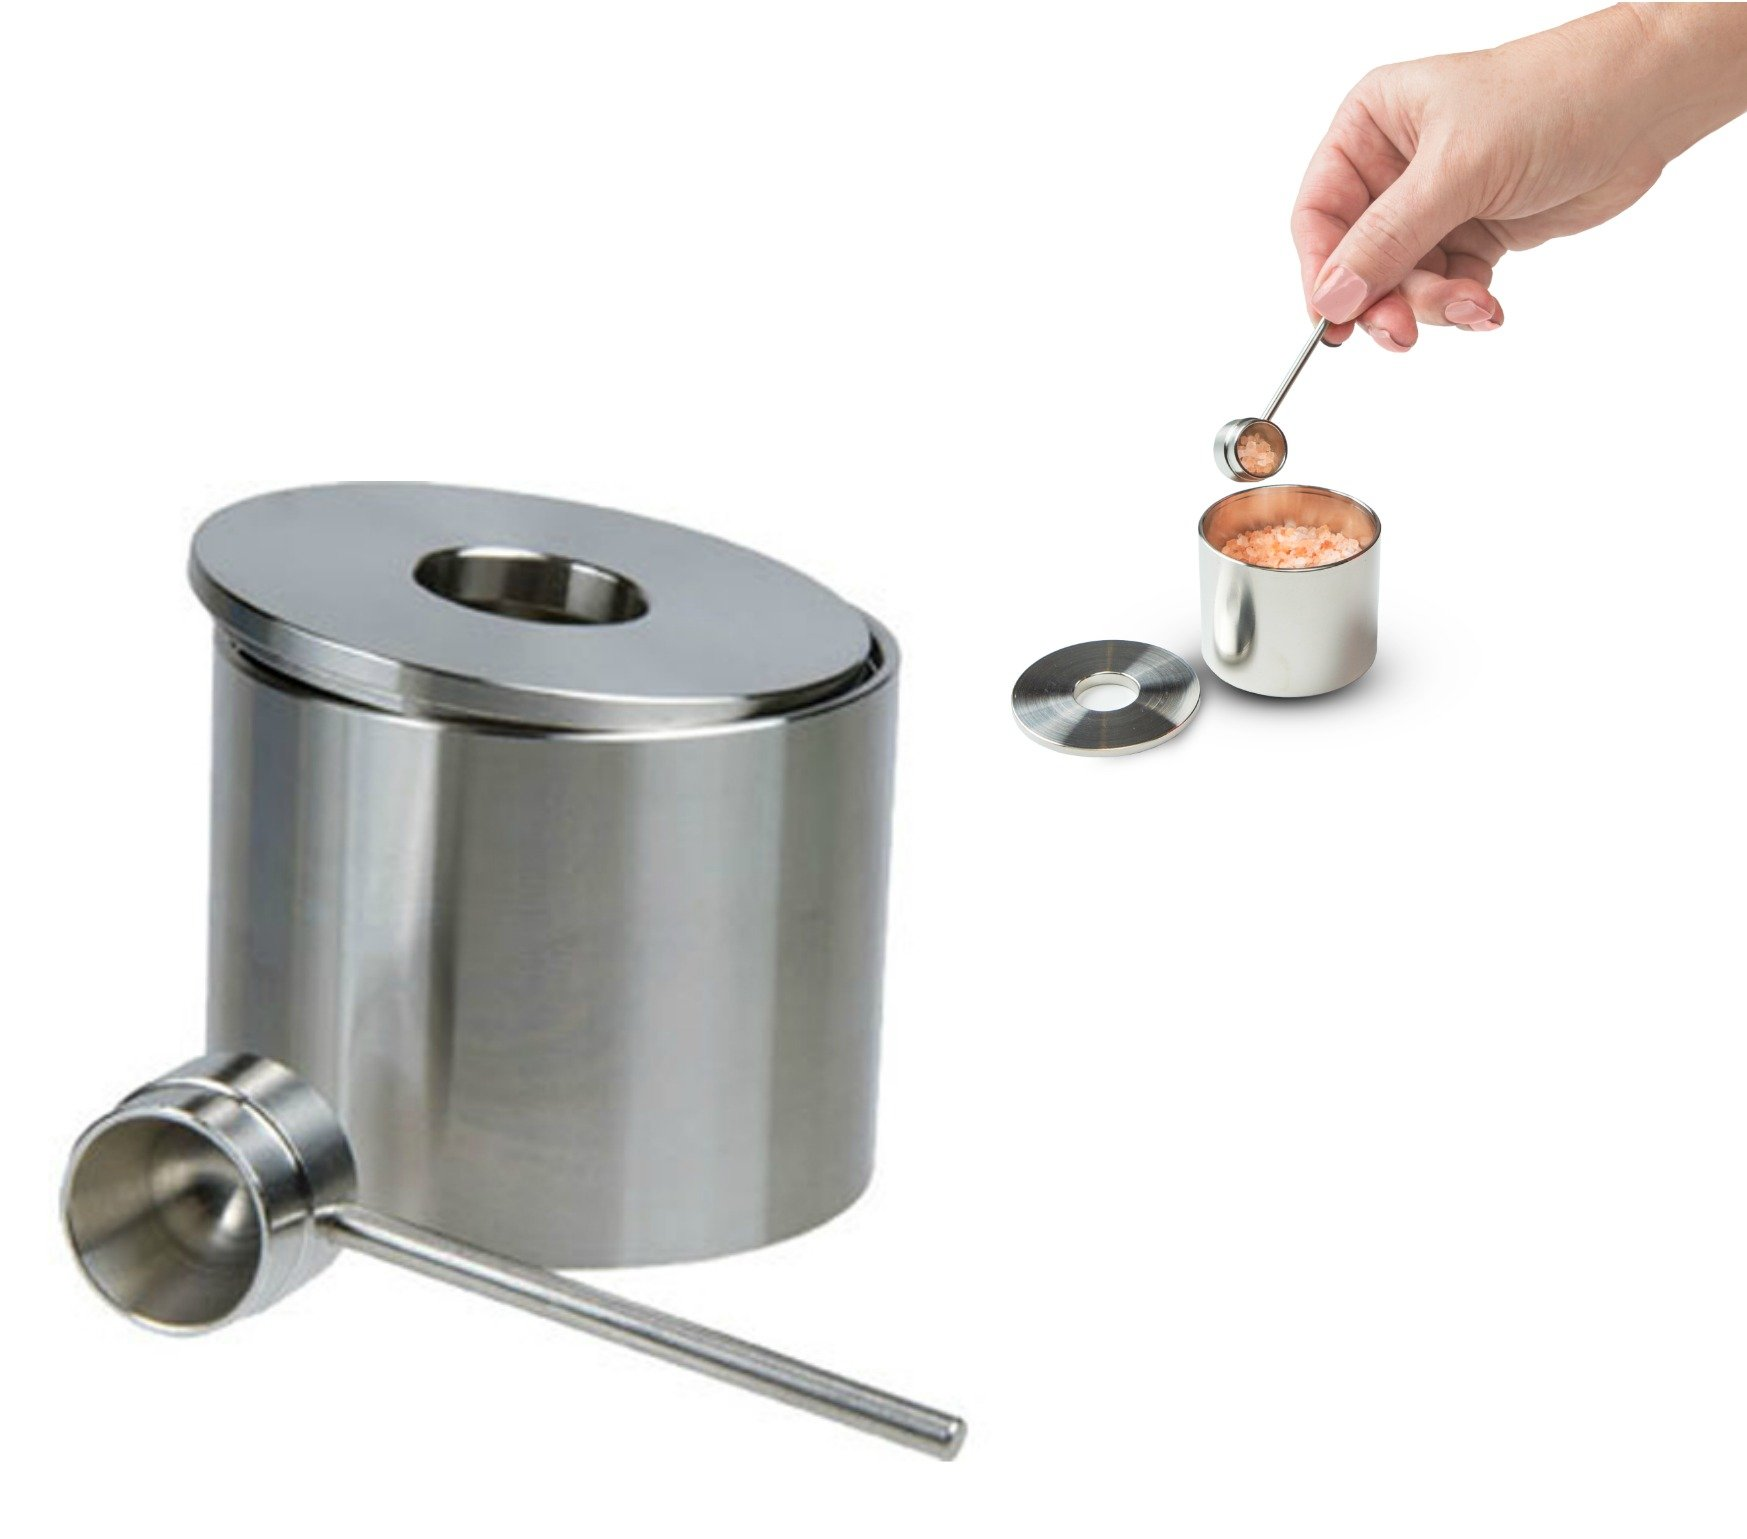 Salt Cellar, Spice Jars Stainless Steel, Grind Gourmet Storage Spice Jars Silver Cellar With Spoon Solid Stainless Steel Holder (1.58'', Silver)